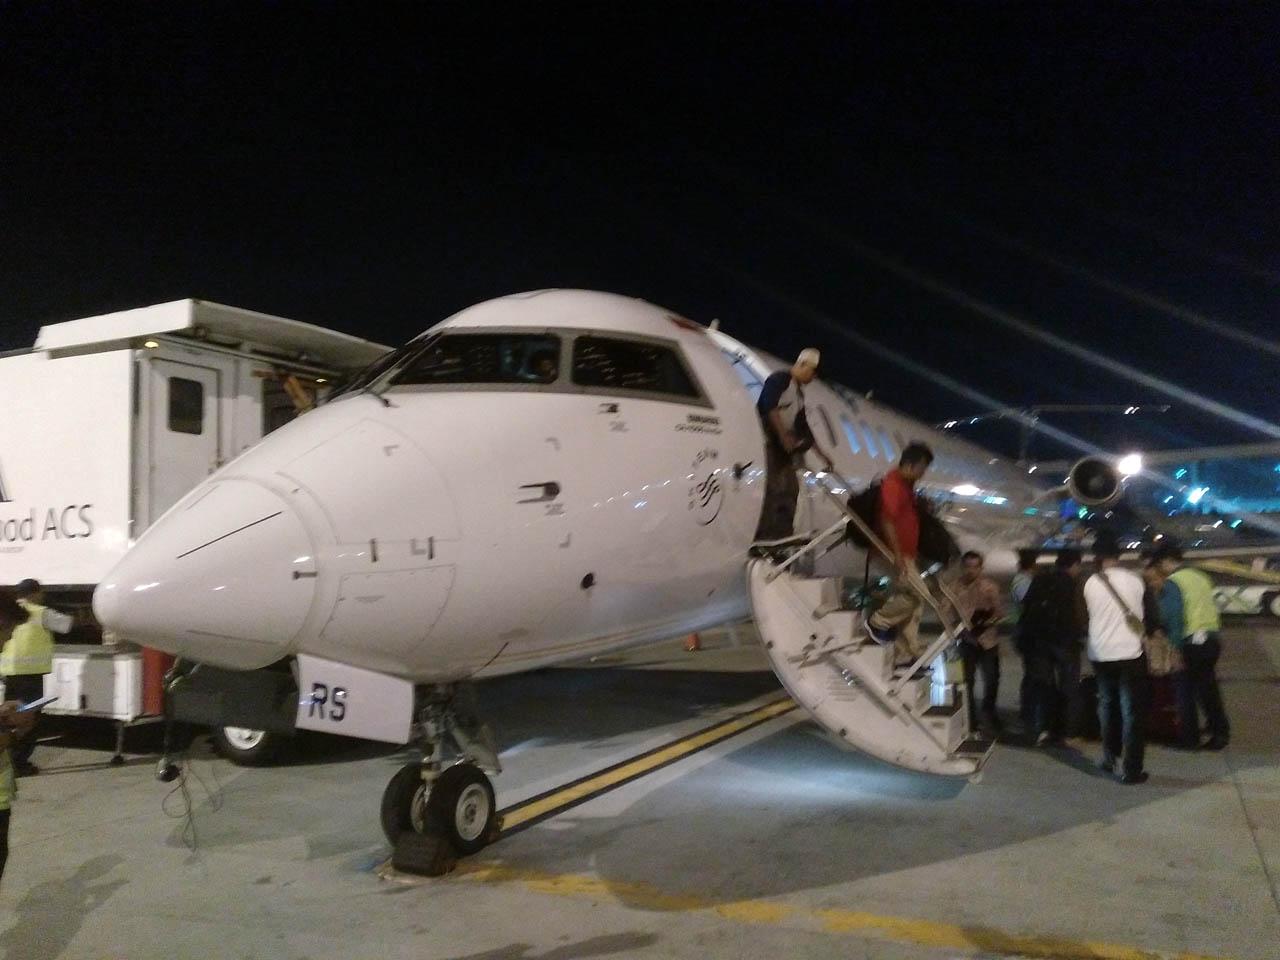 Asiiik Sekarang Sudah Ada Penerbangan Langsung Garuda Jakarta Banyuwangi Yopiefranz